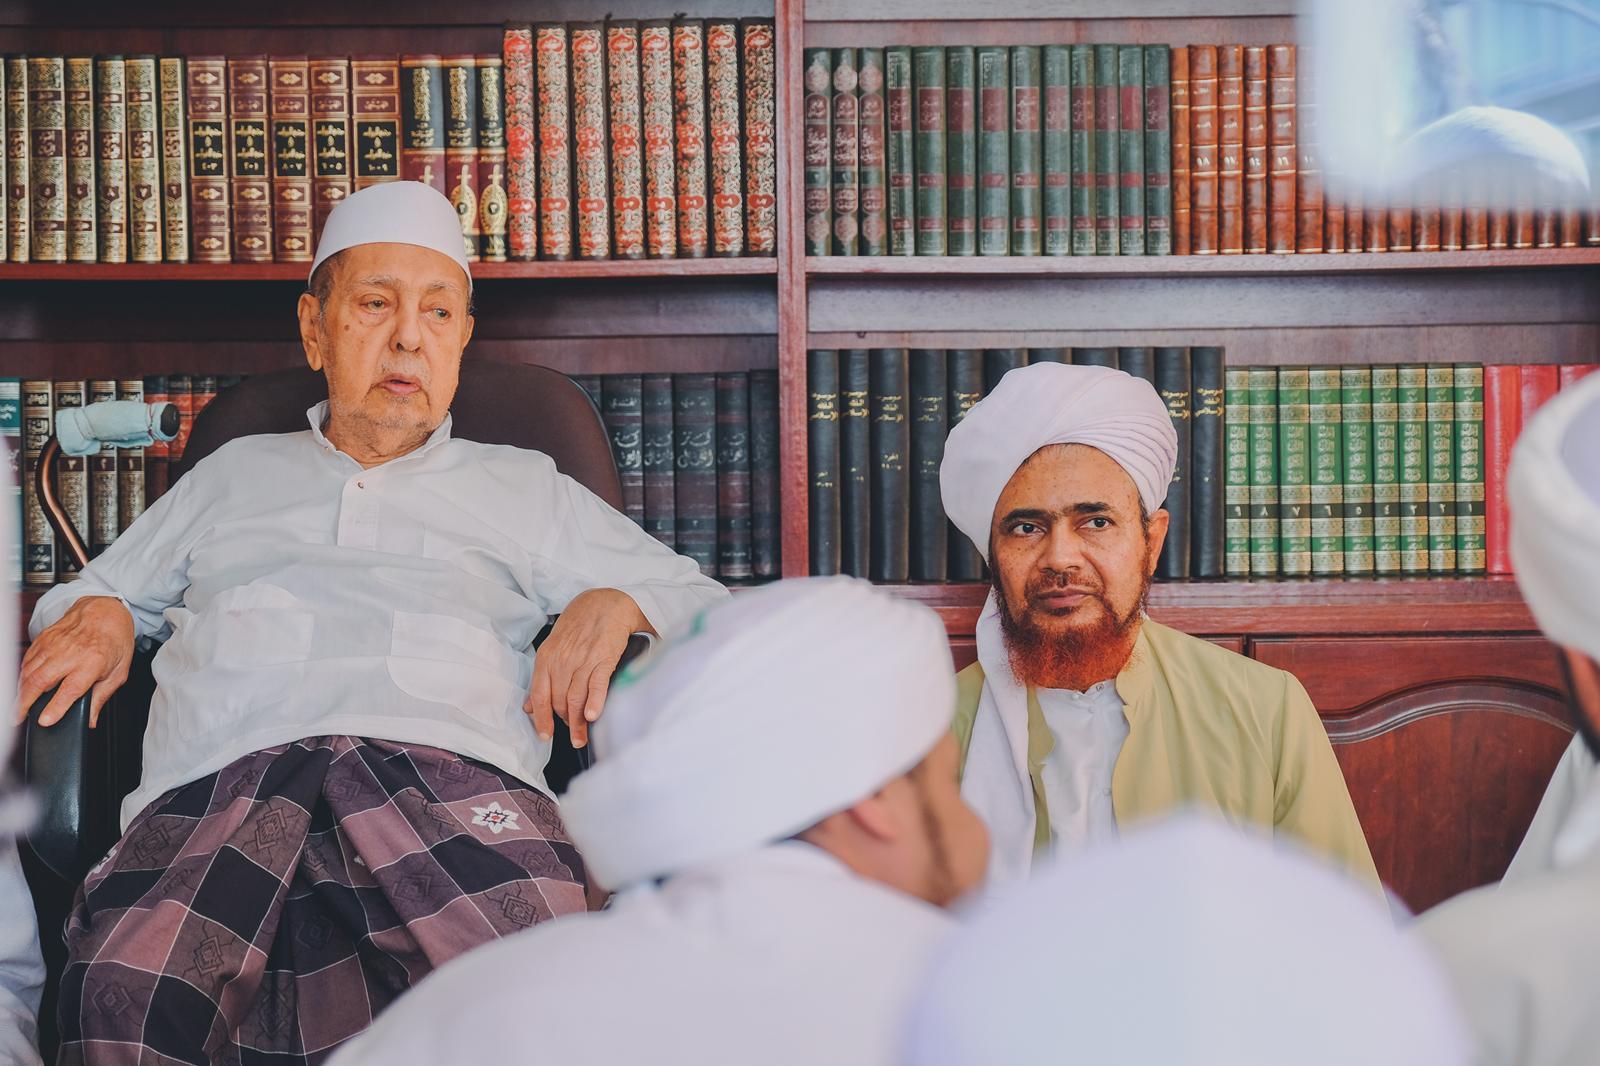 Habib Abbas al-Saqqaf